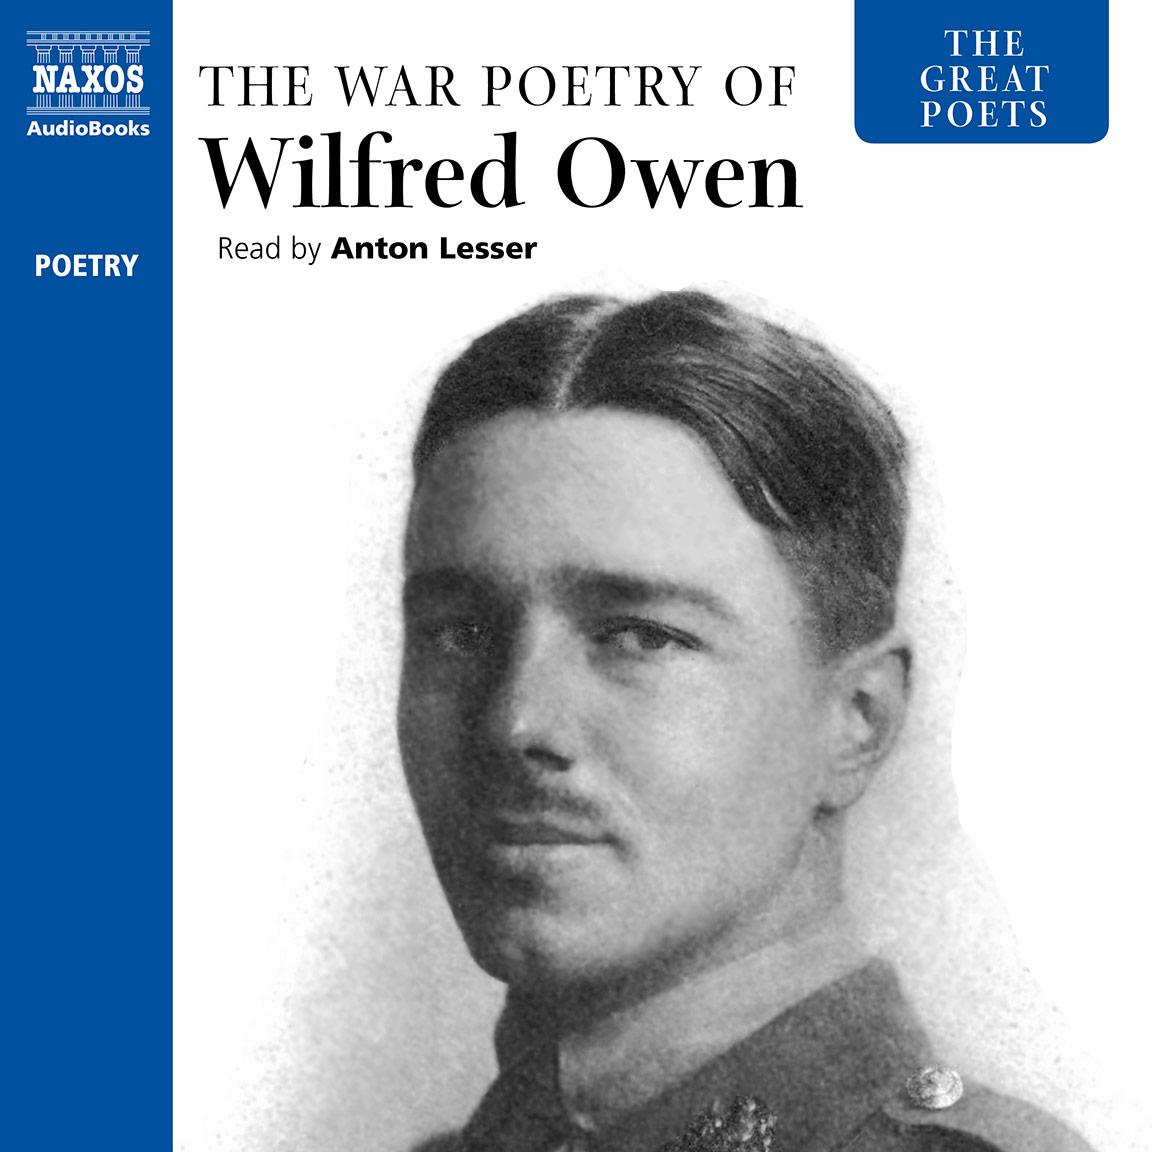 Great Poets: The War Poetry of Wilfred Owen